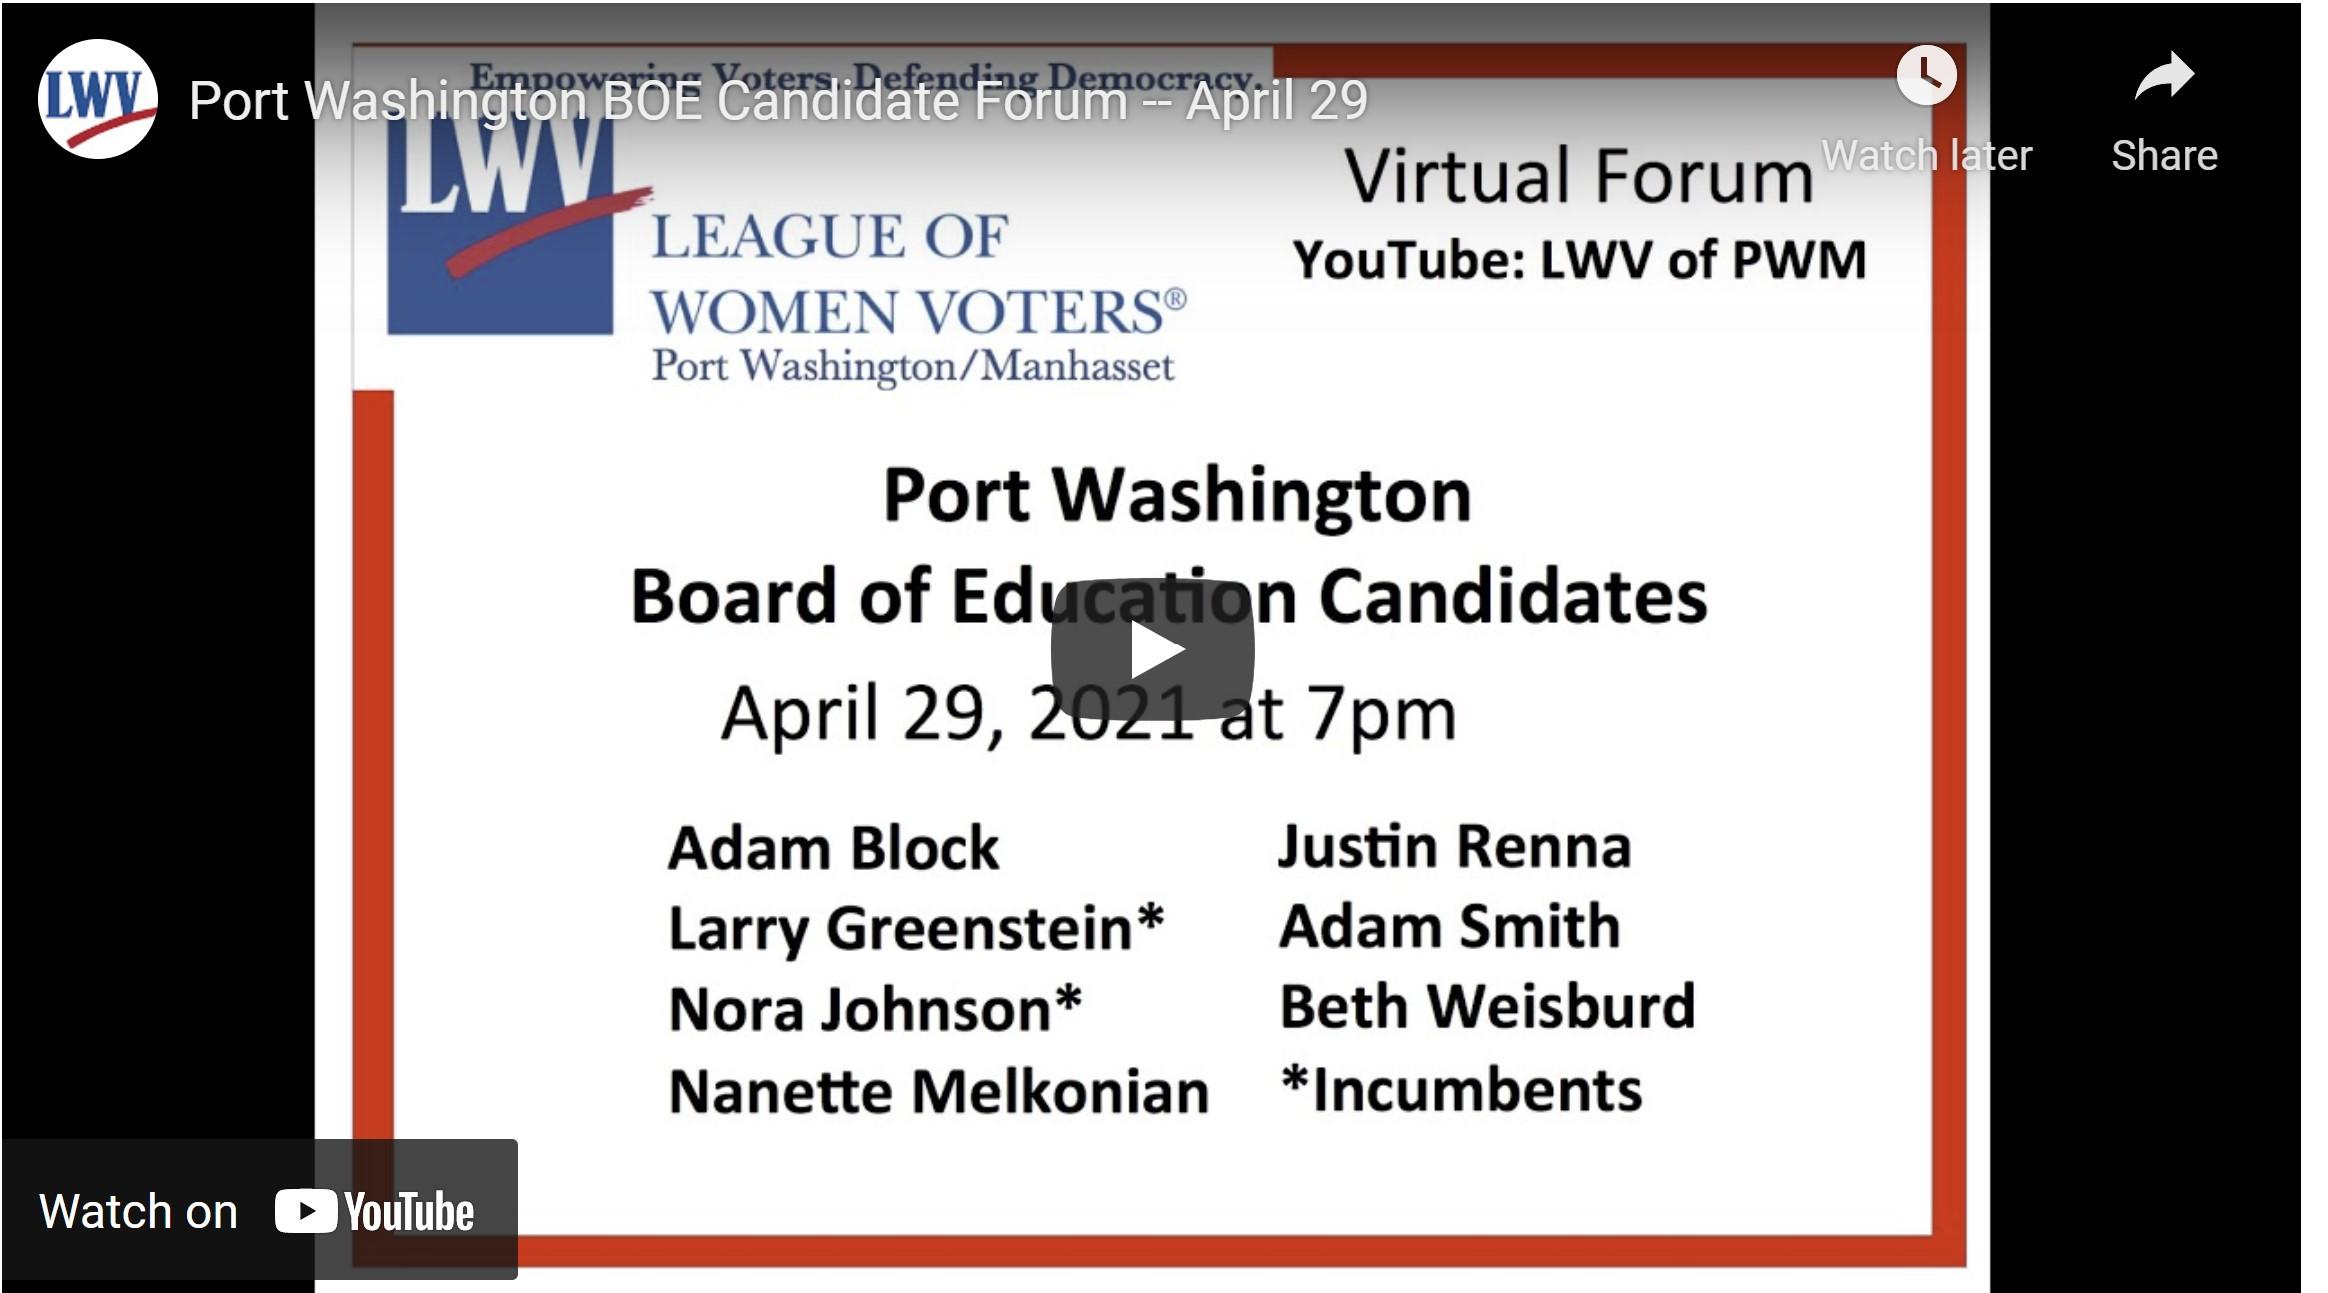 Port Washington Board of Education